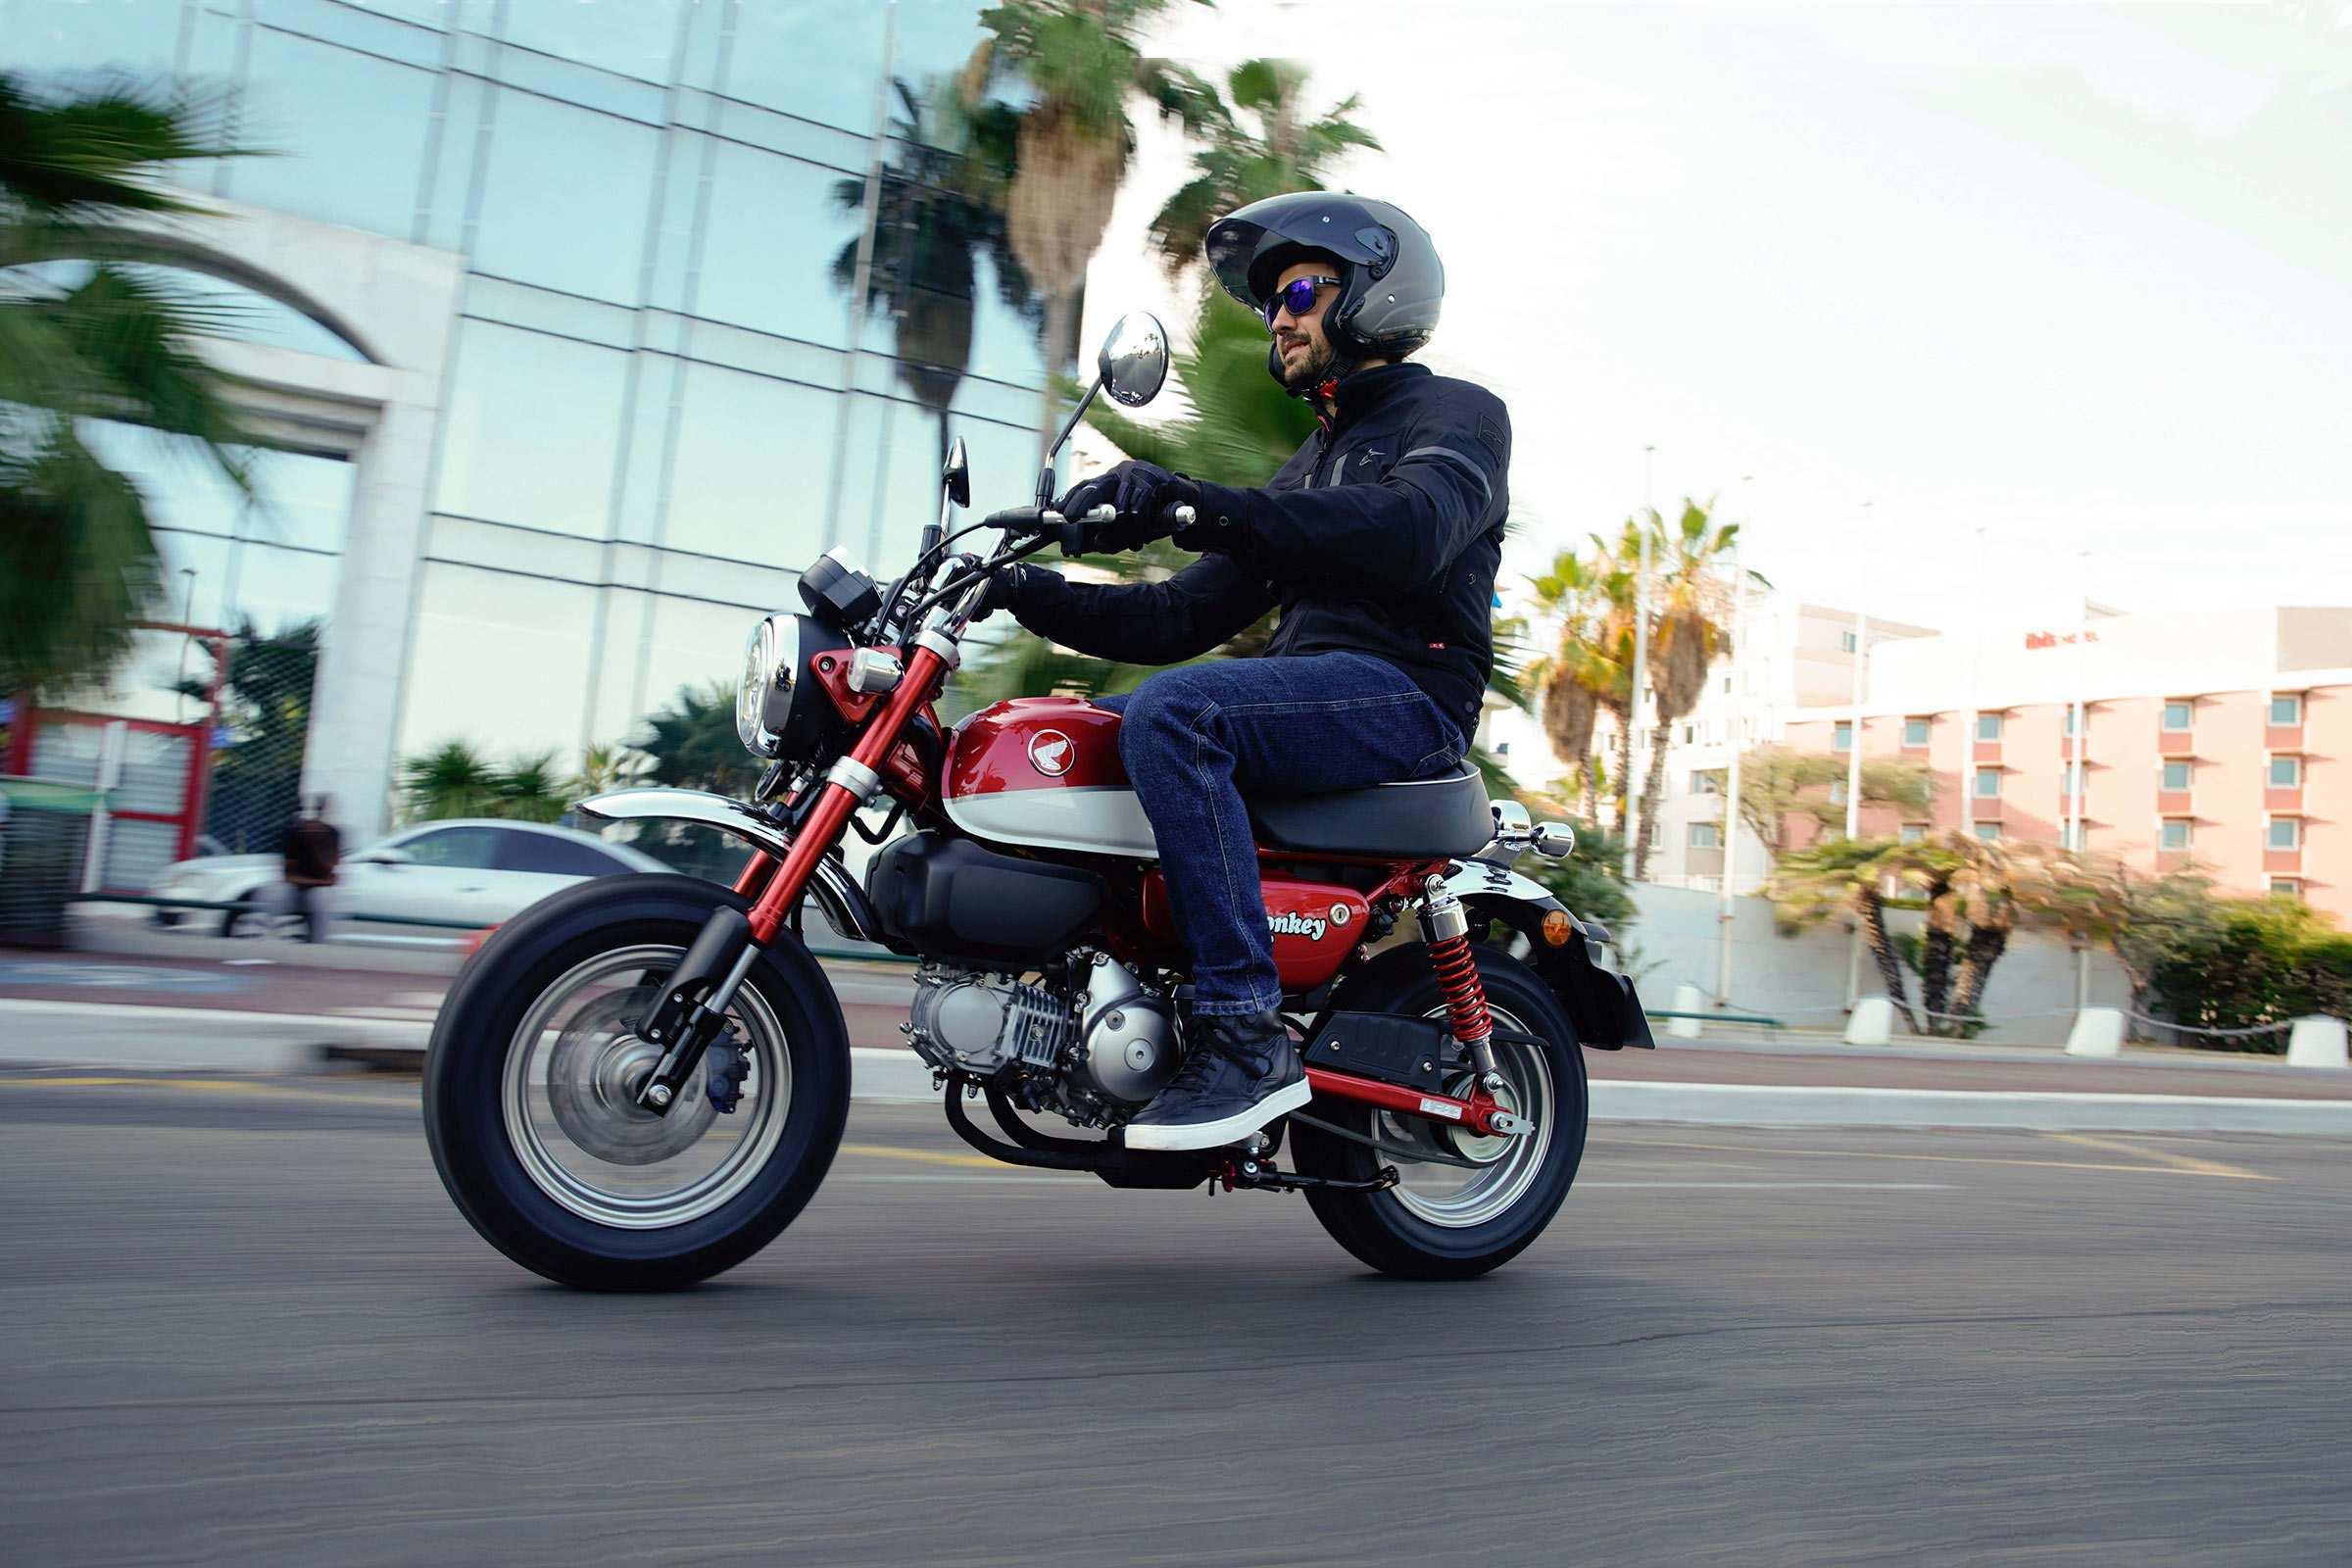 81 New Monkey Honda 2019 Price Price with Monkey Honda 2019 Price